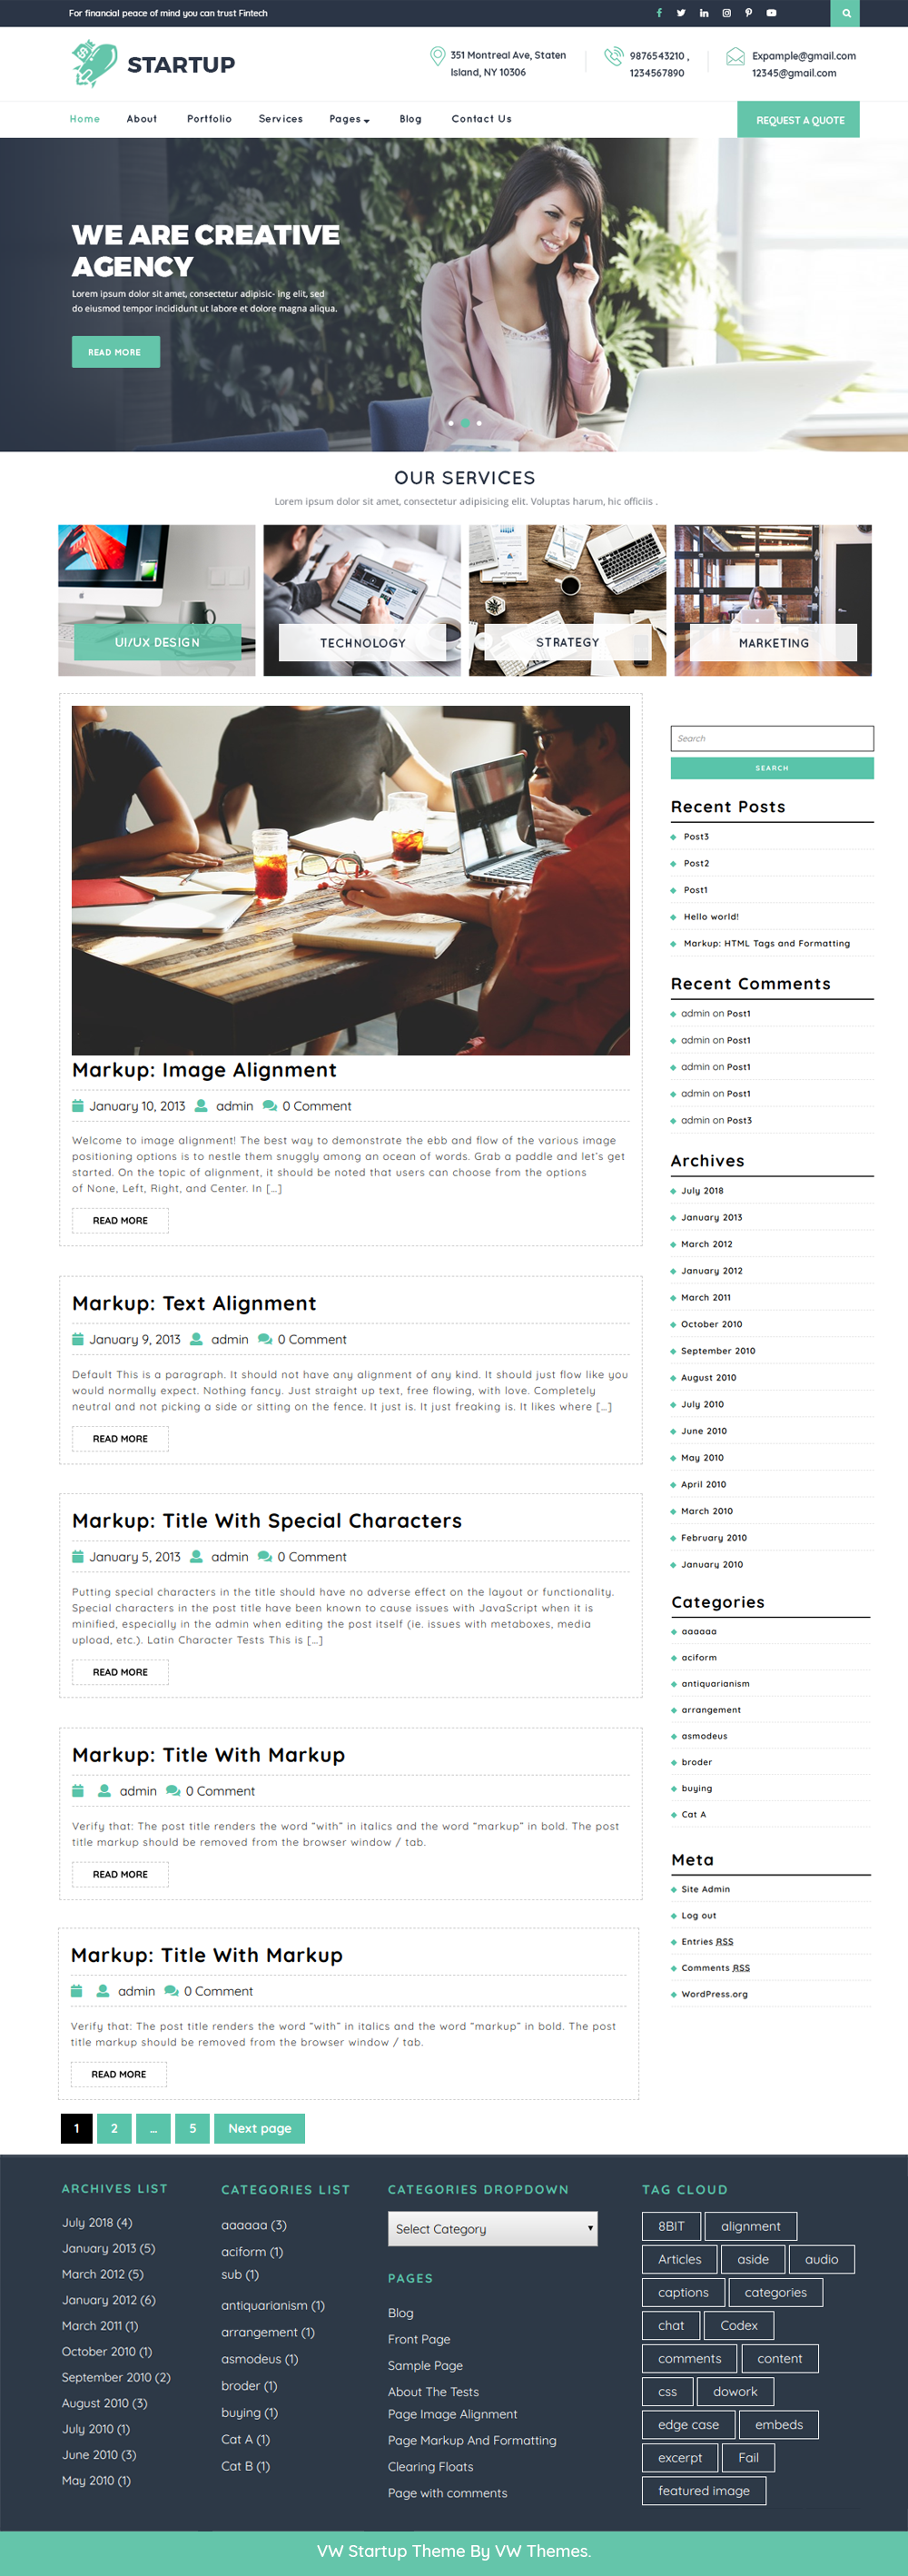 Free Startup WordPress Theme